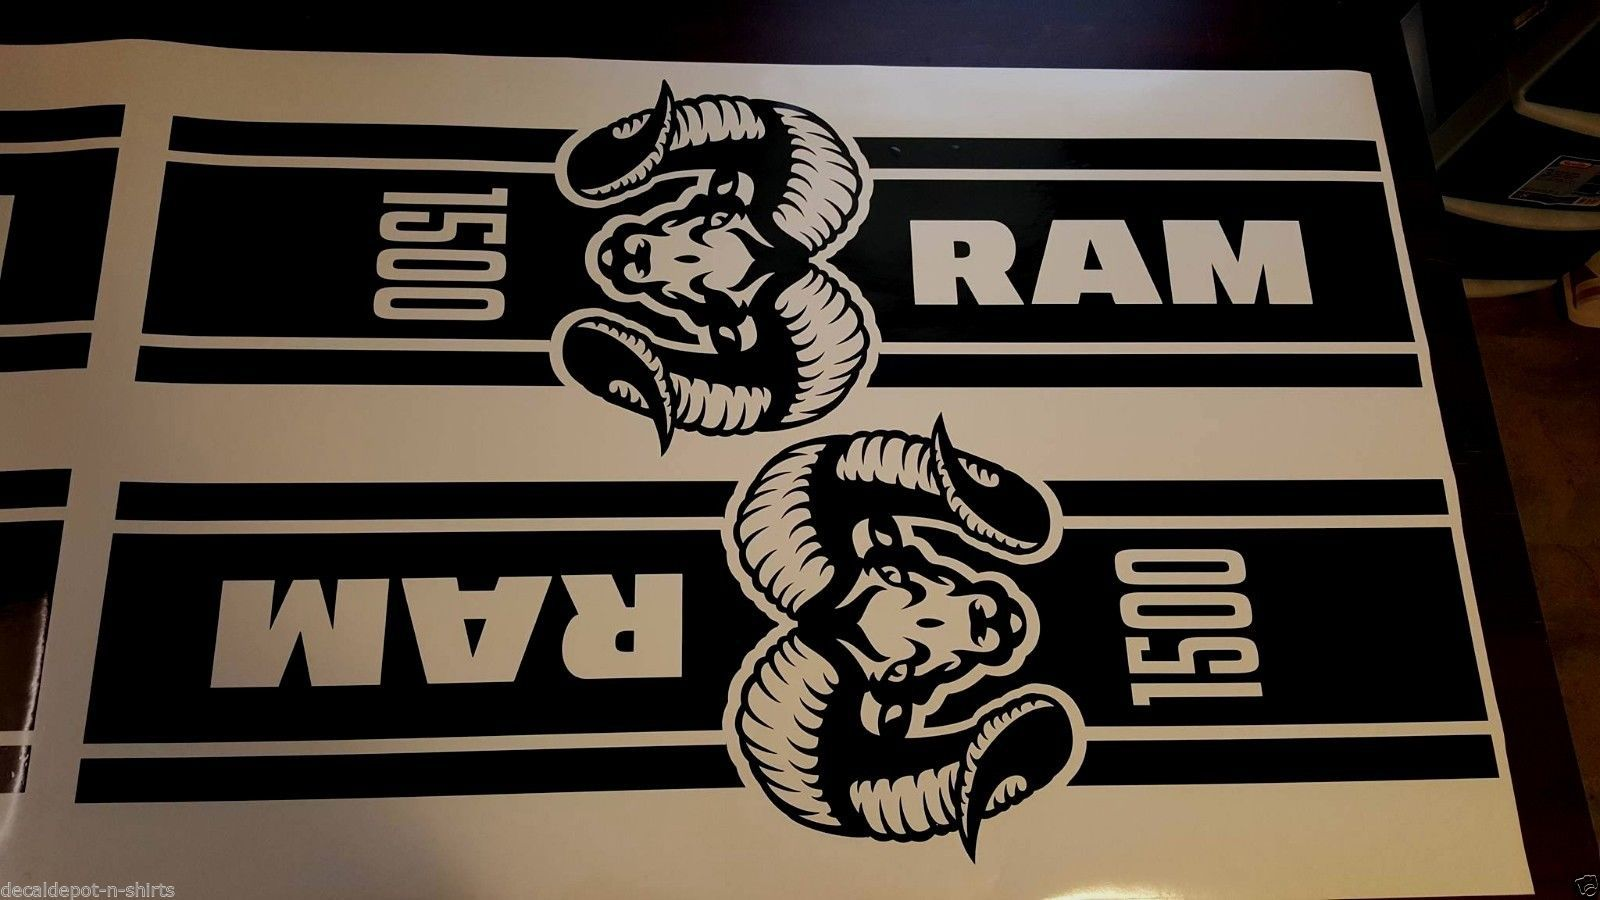 Dodge Ram 1500 2500 3500 Truck Bed Box Graphic Stripes